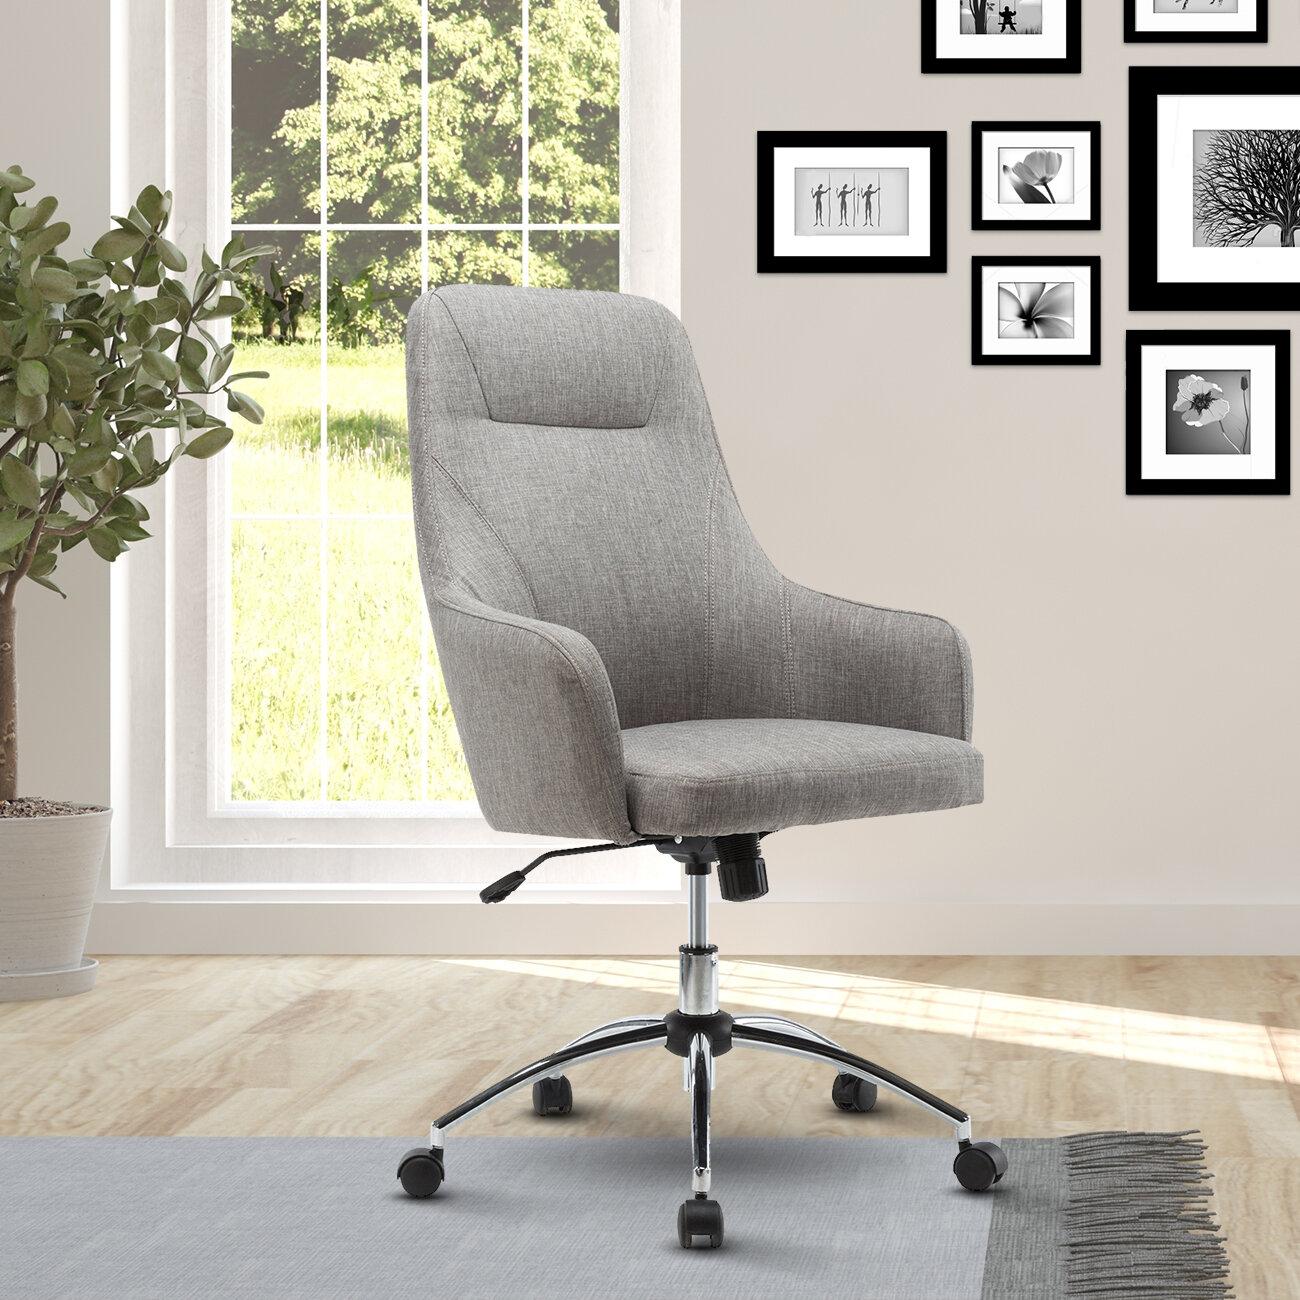 Ebern Designs Fowler Comfy Height Adjustable Rolling Office High Back  Executive Chair U0026 Reviews | Wayfair